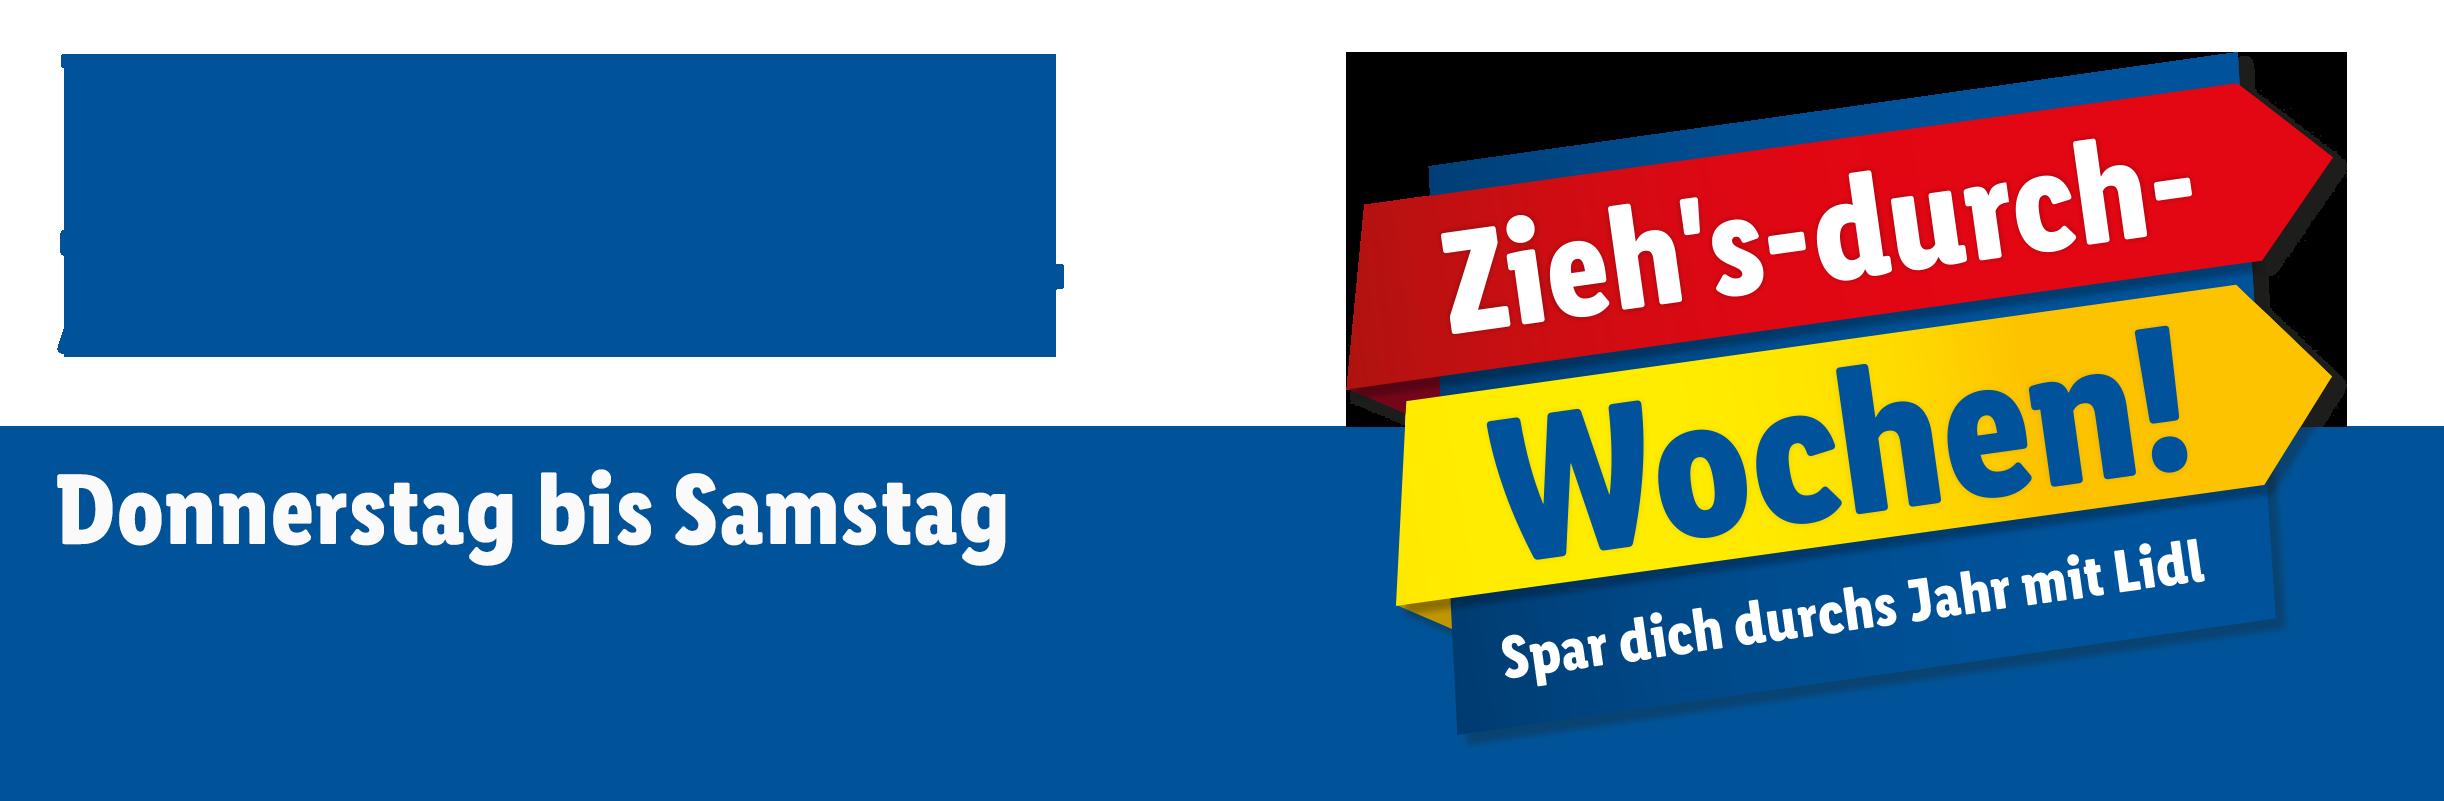 Donnerstag 2401 Lidl Deutschland Lidlde